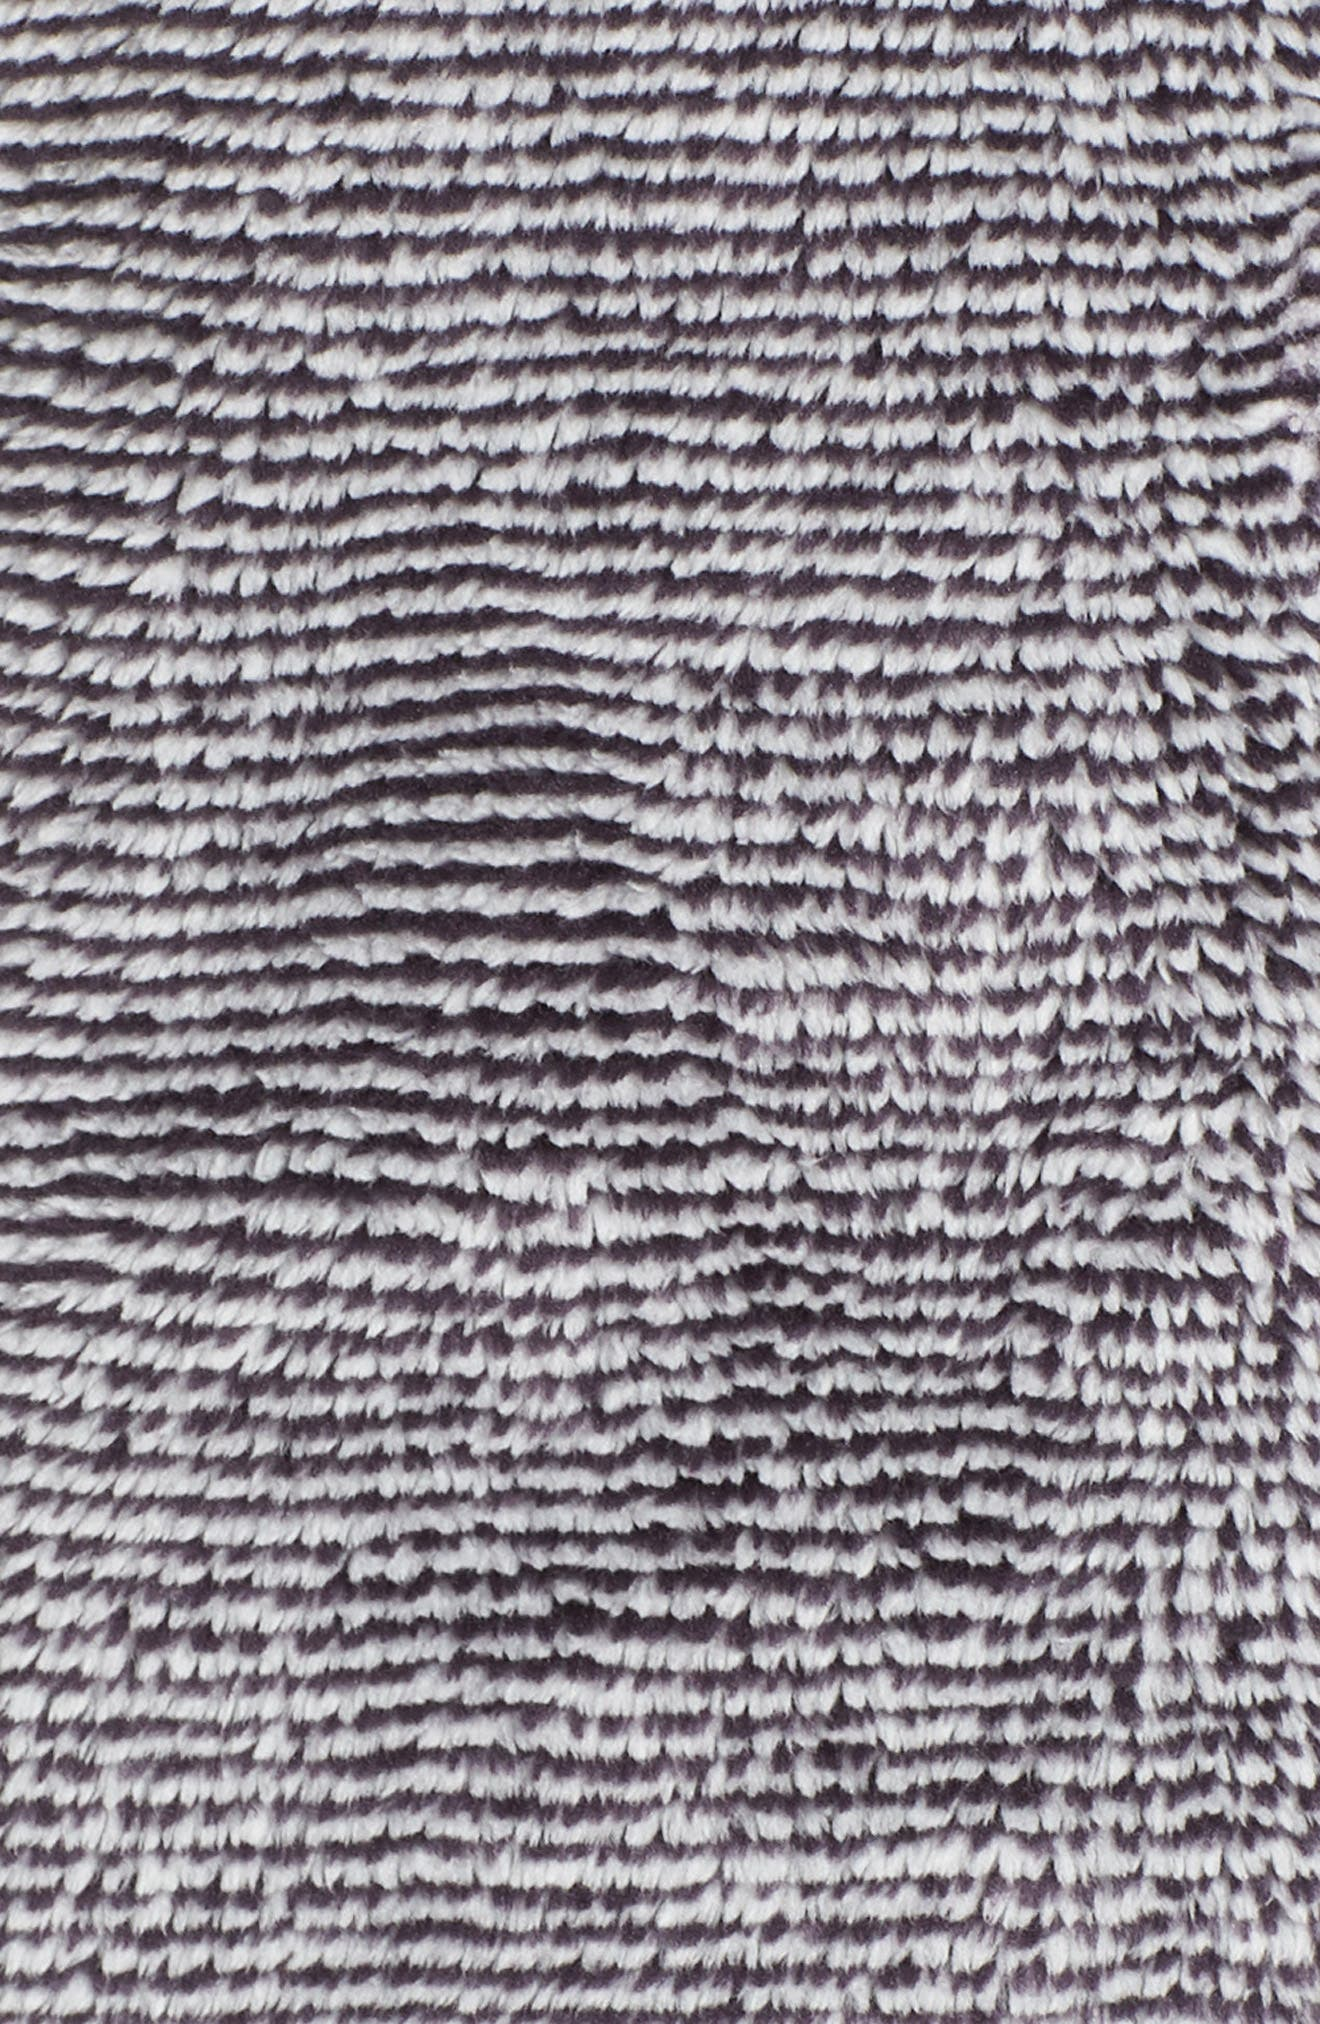 THE NORTH FACE, Osito 2 Stripe Fleece Jacket, Alternate thumbnail 7, color, BLACK/ TIN GREY STRIPE